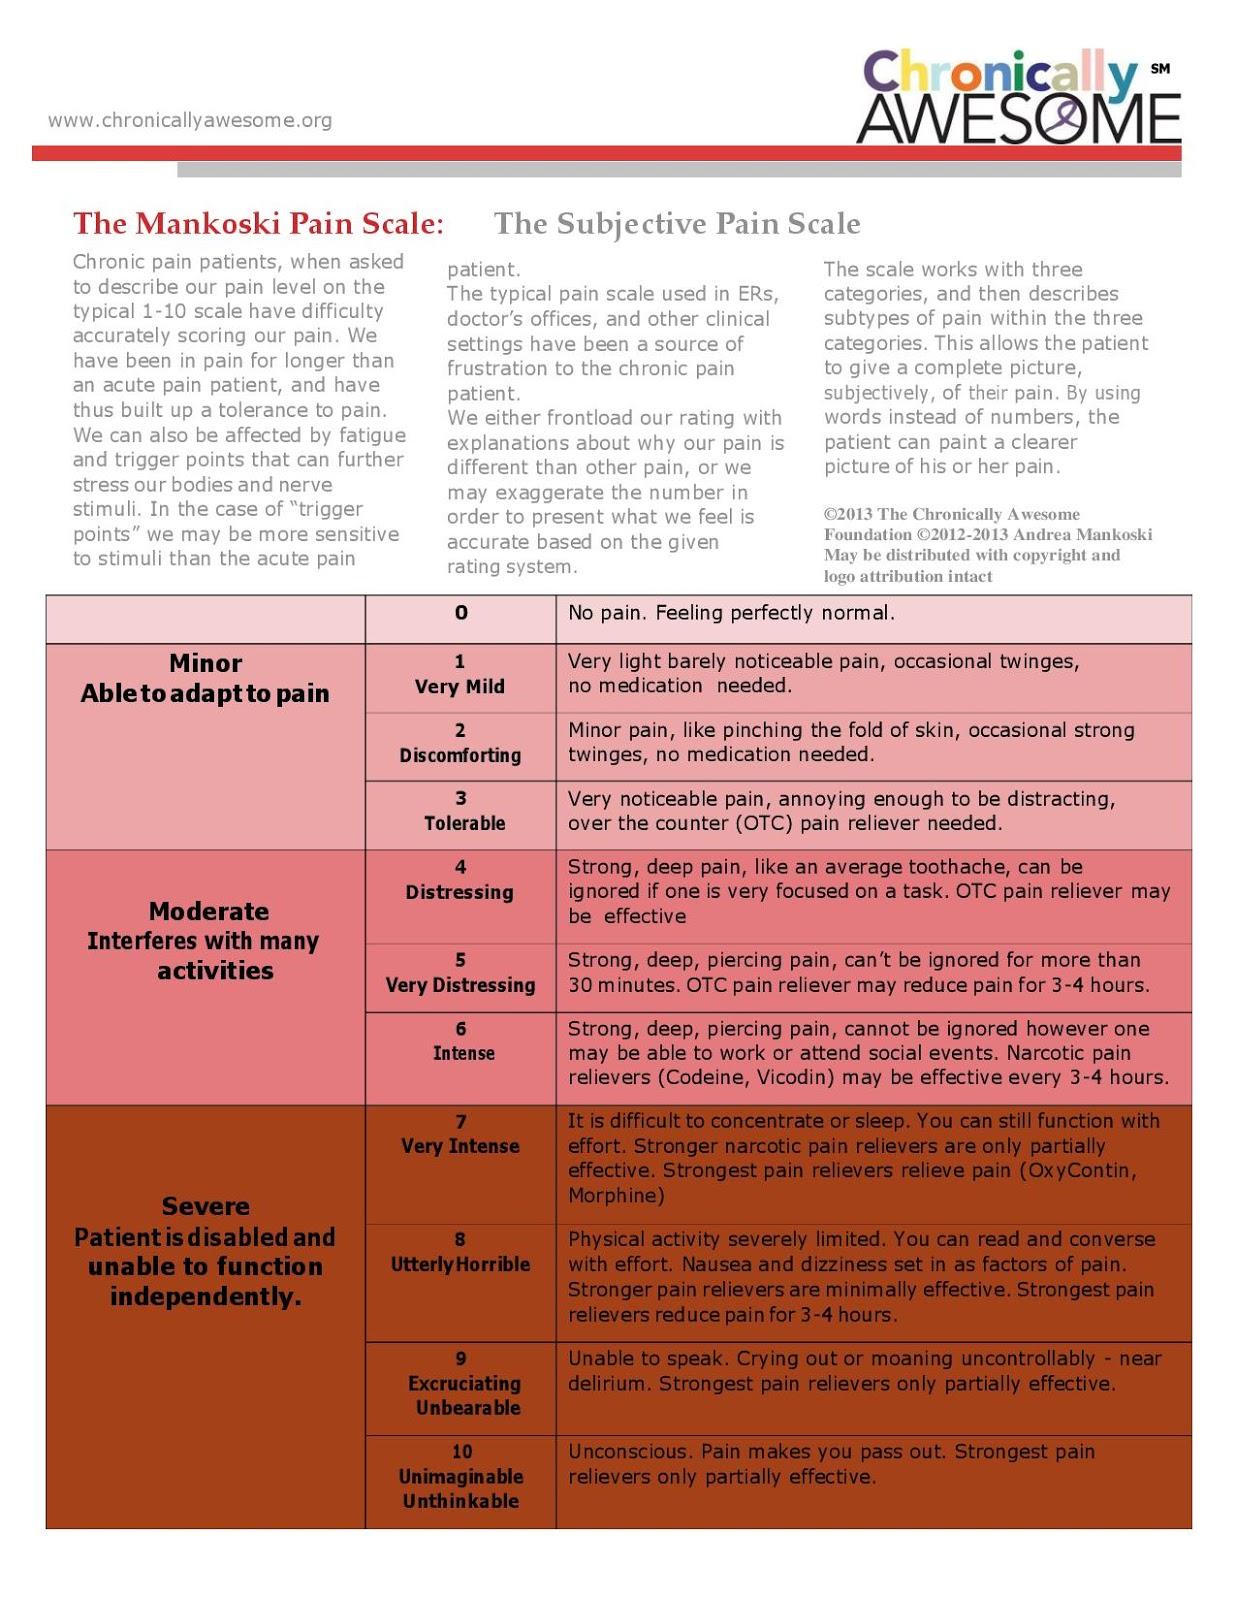 Mankoski%2BSubjective%2BPain%2BScale%2B%2528final%2529 page 001 best ever mankoski subjective pain scale for chronic pain